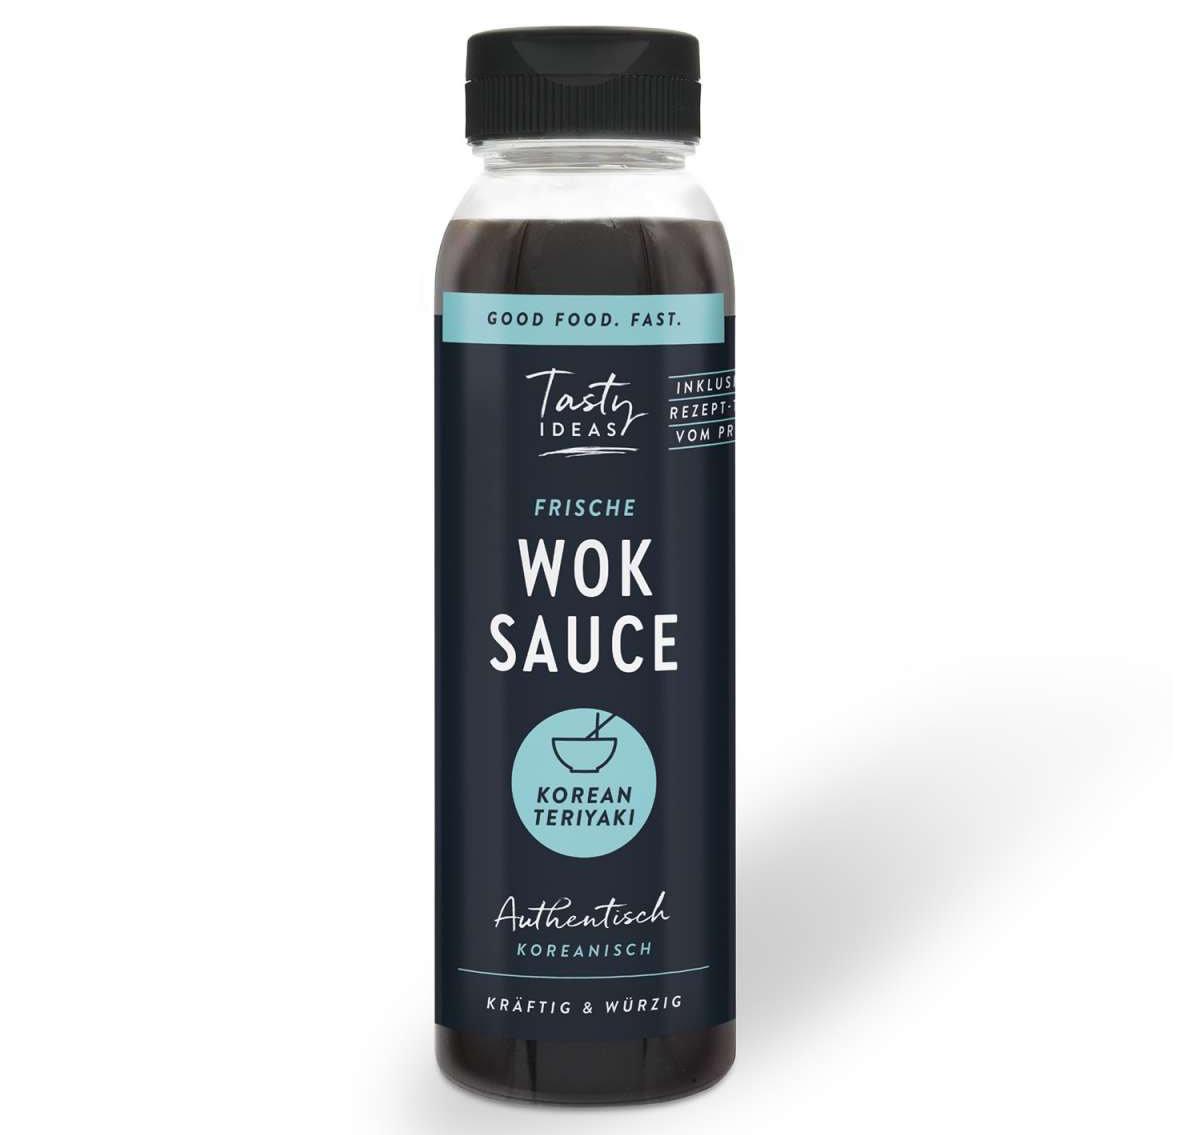 TASTY IDEAS TASTY IDEAS Wok Sauce - Korean Teriyaki